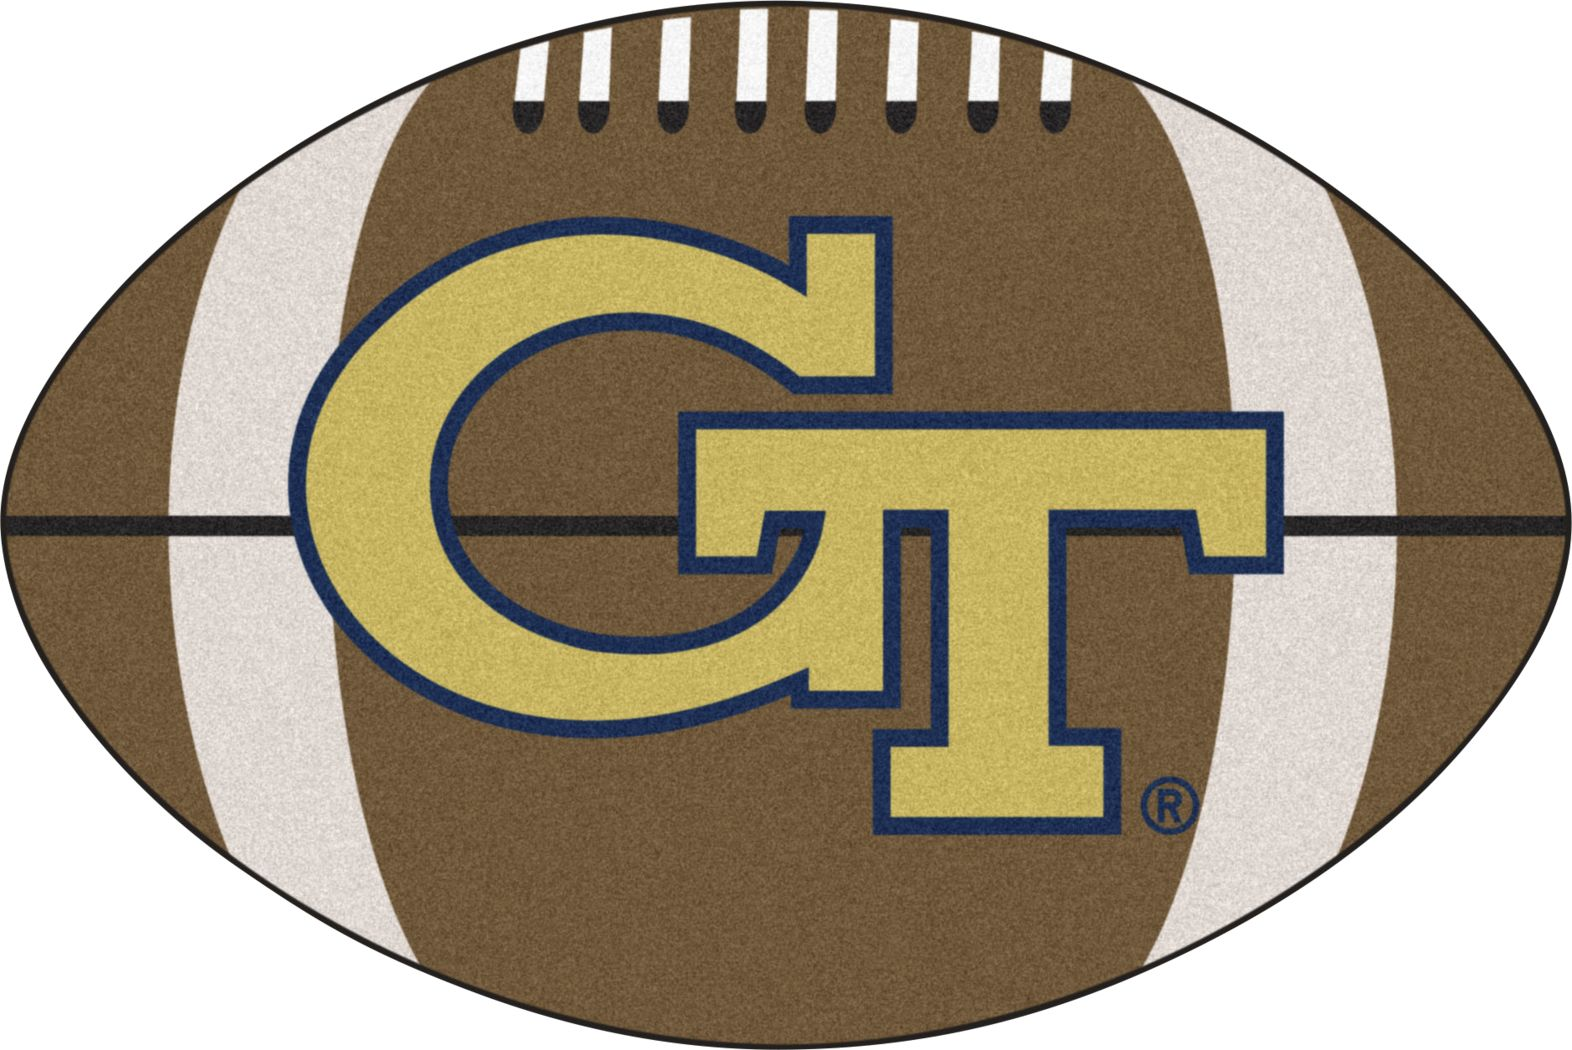 "NCAA Football Mascot Georgia Tech 1'6"" x 1'10"" Rug"